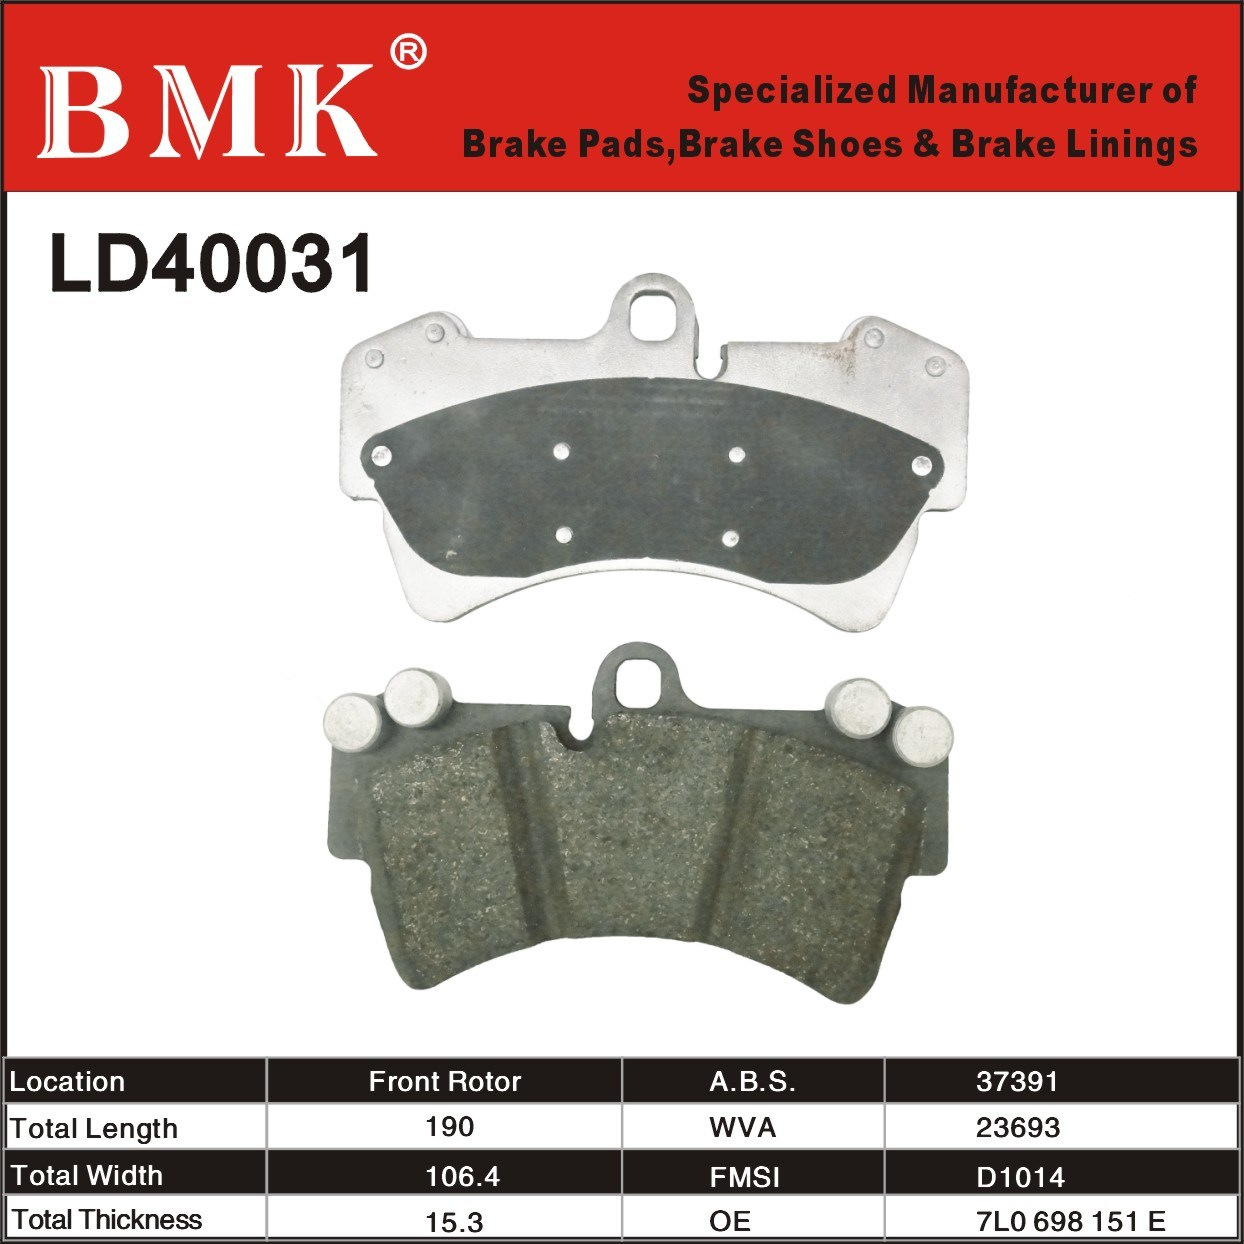 Premium Quality Front Brake Pads (LD40031) for Audi, Porsche, Touareg